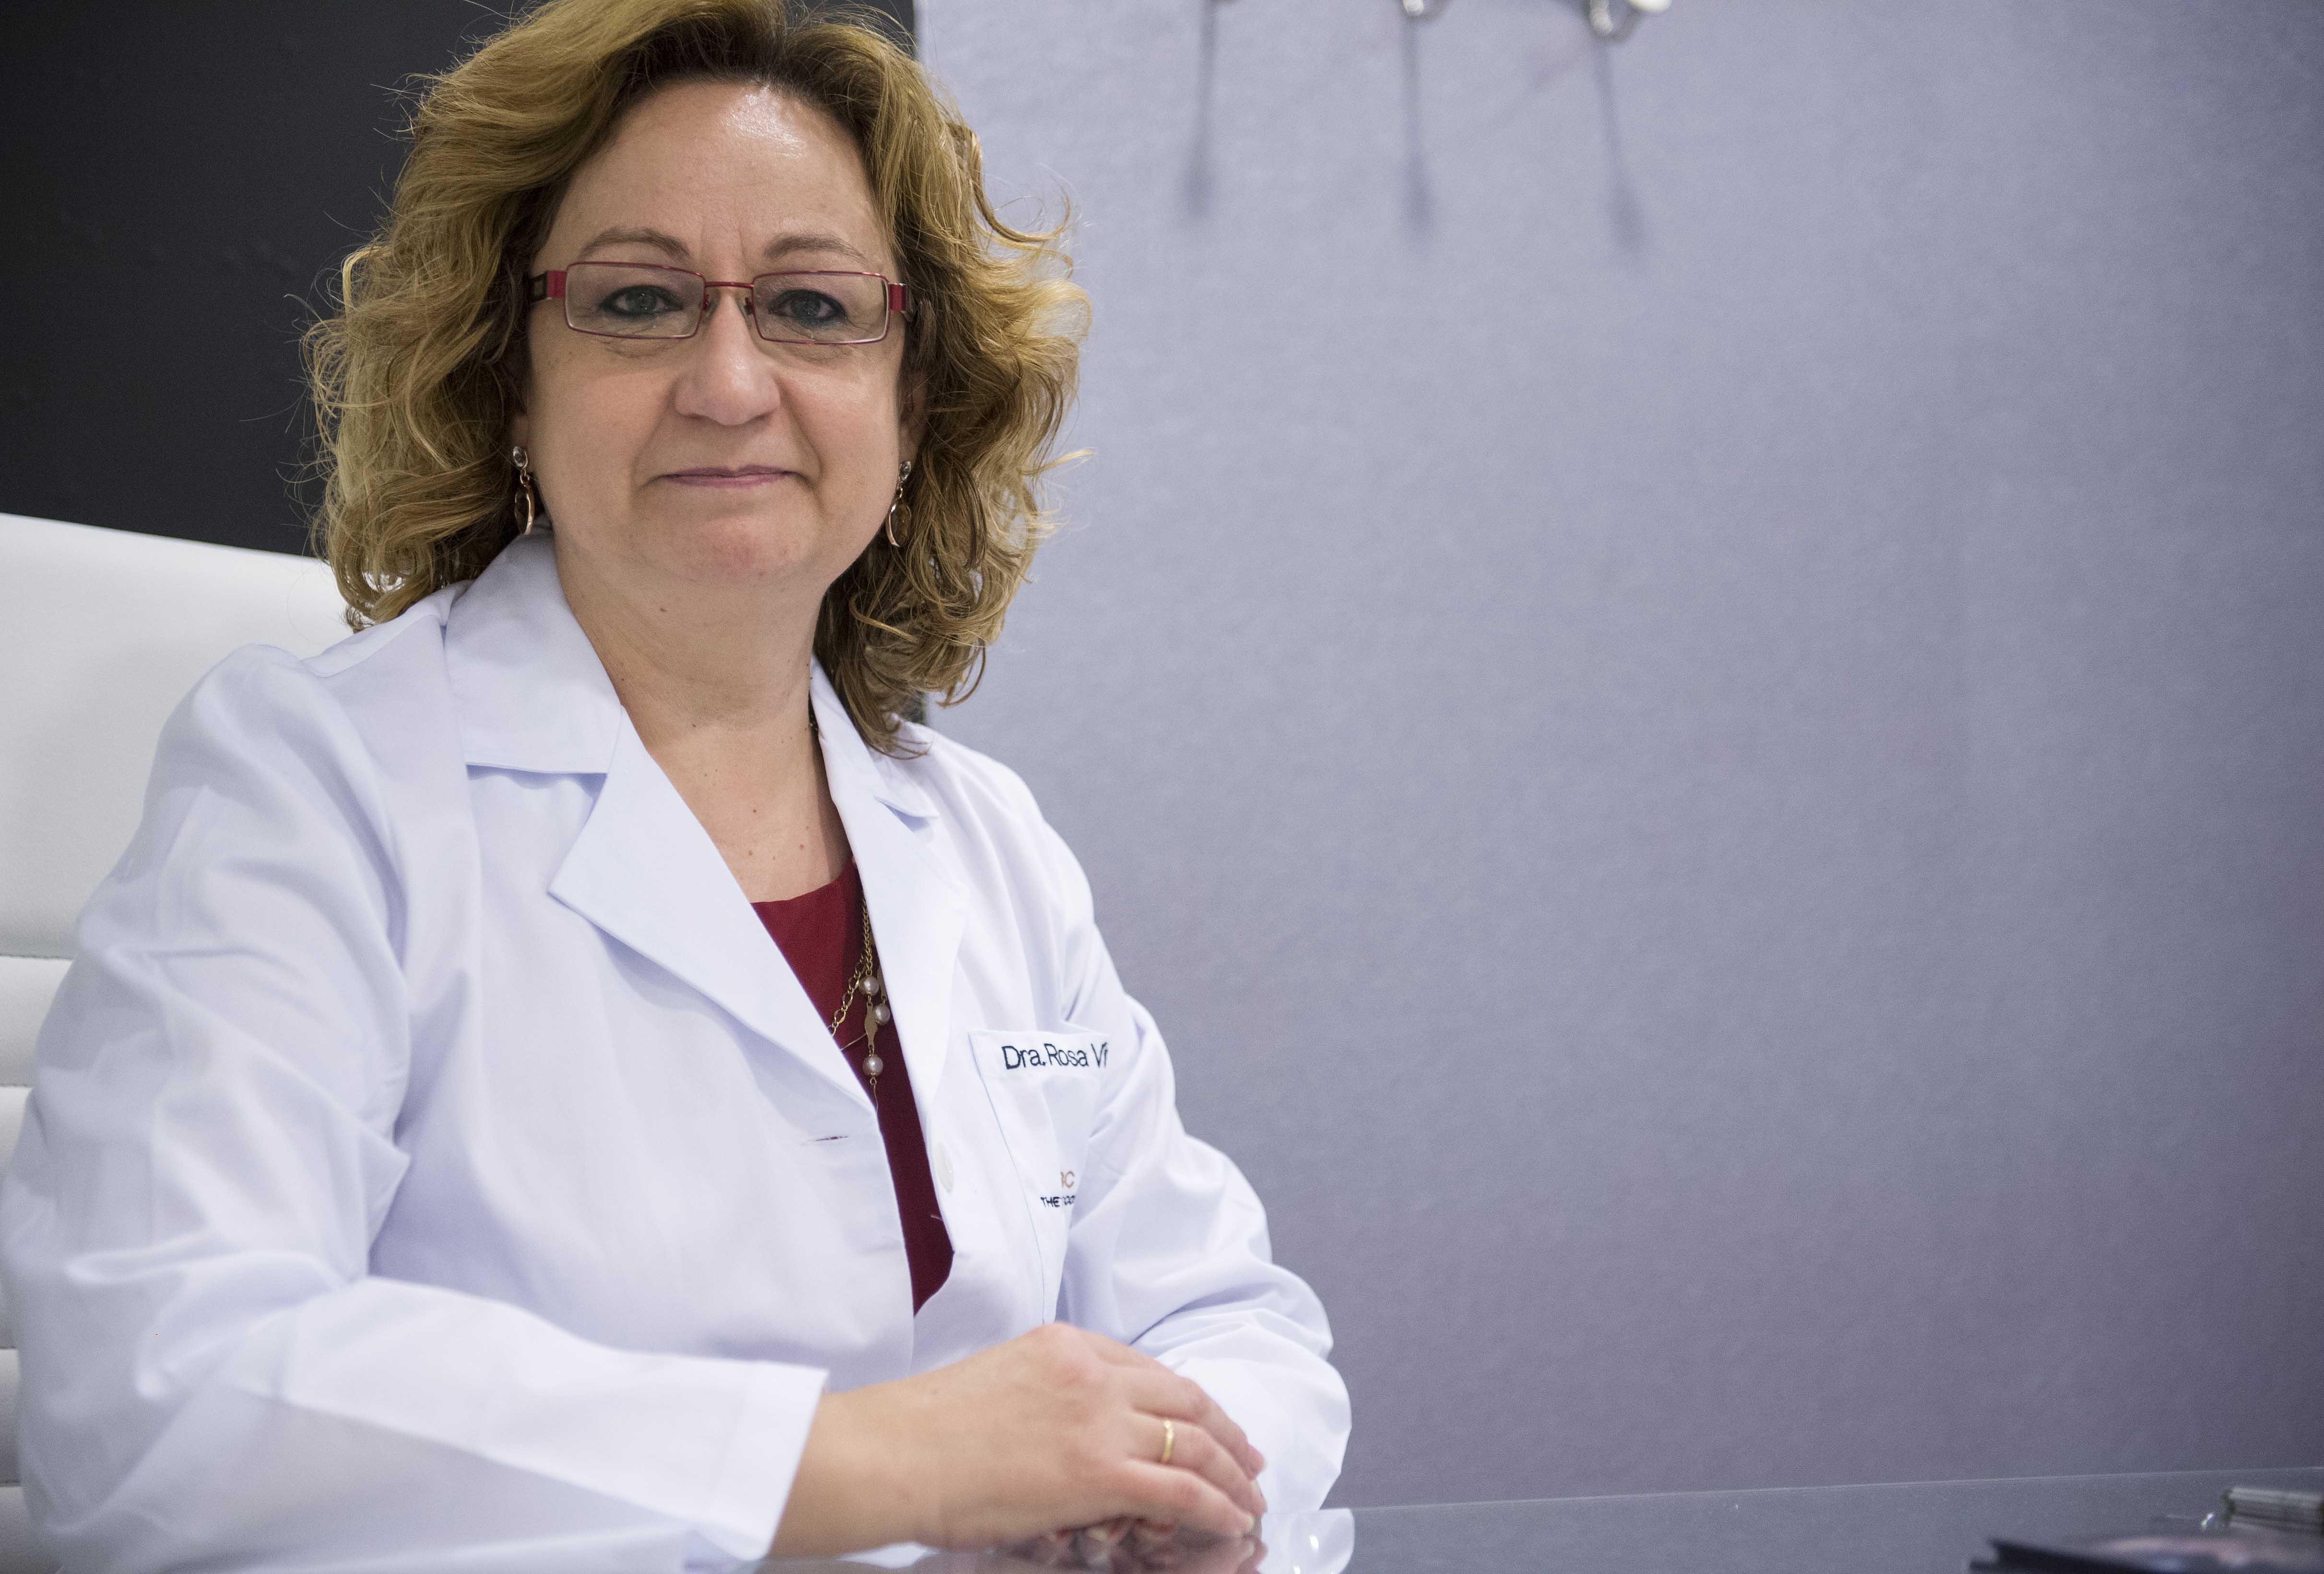 Doctora Rosa Viana